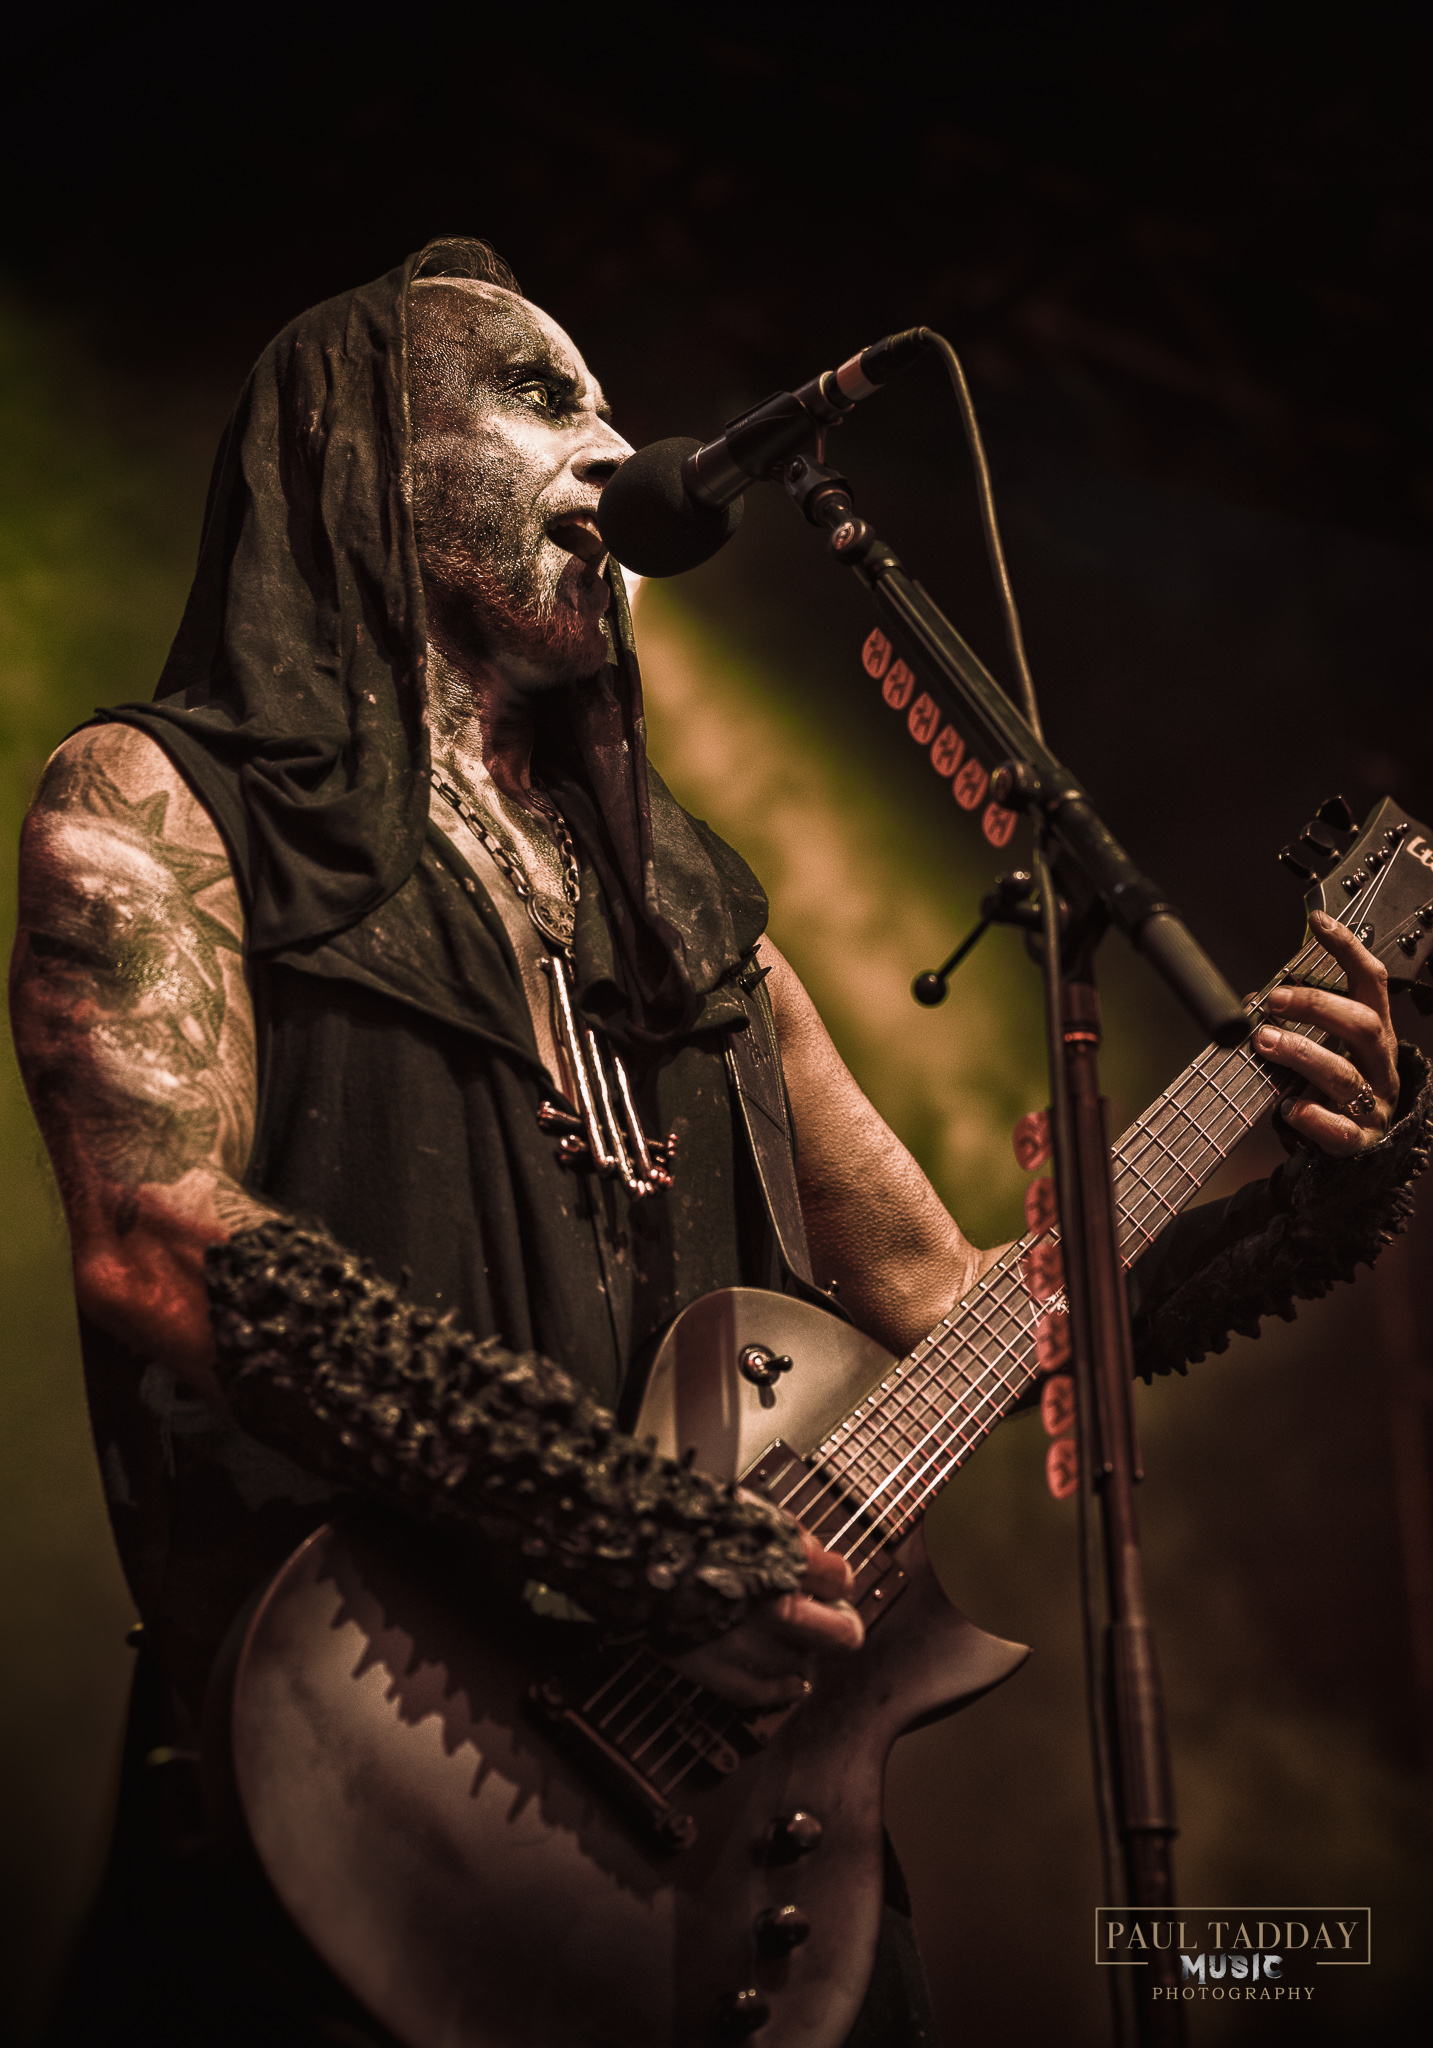 behemoth - brisbane - march 7 2019 - web - paul tadday photography - 6.jpg